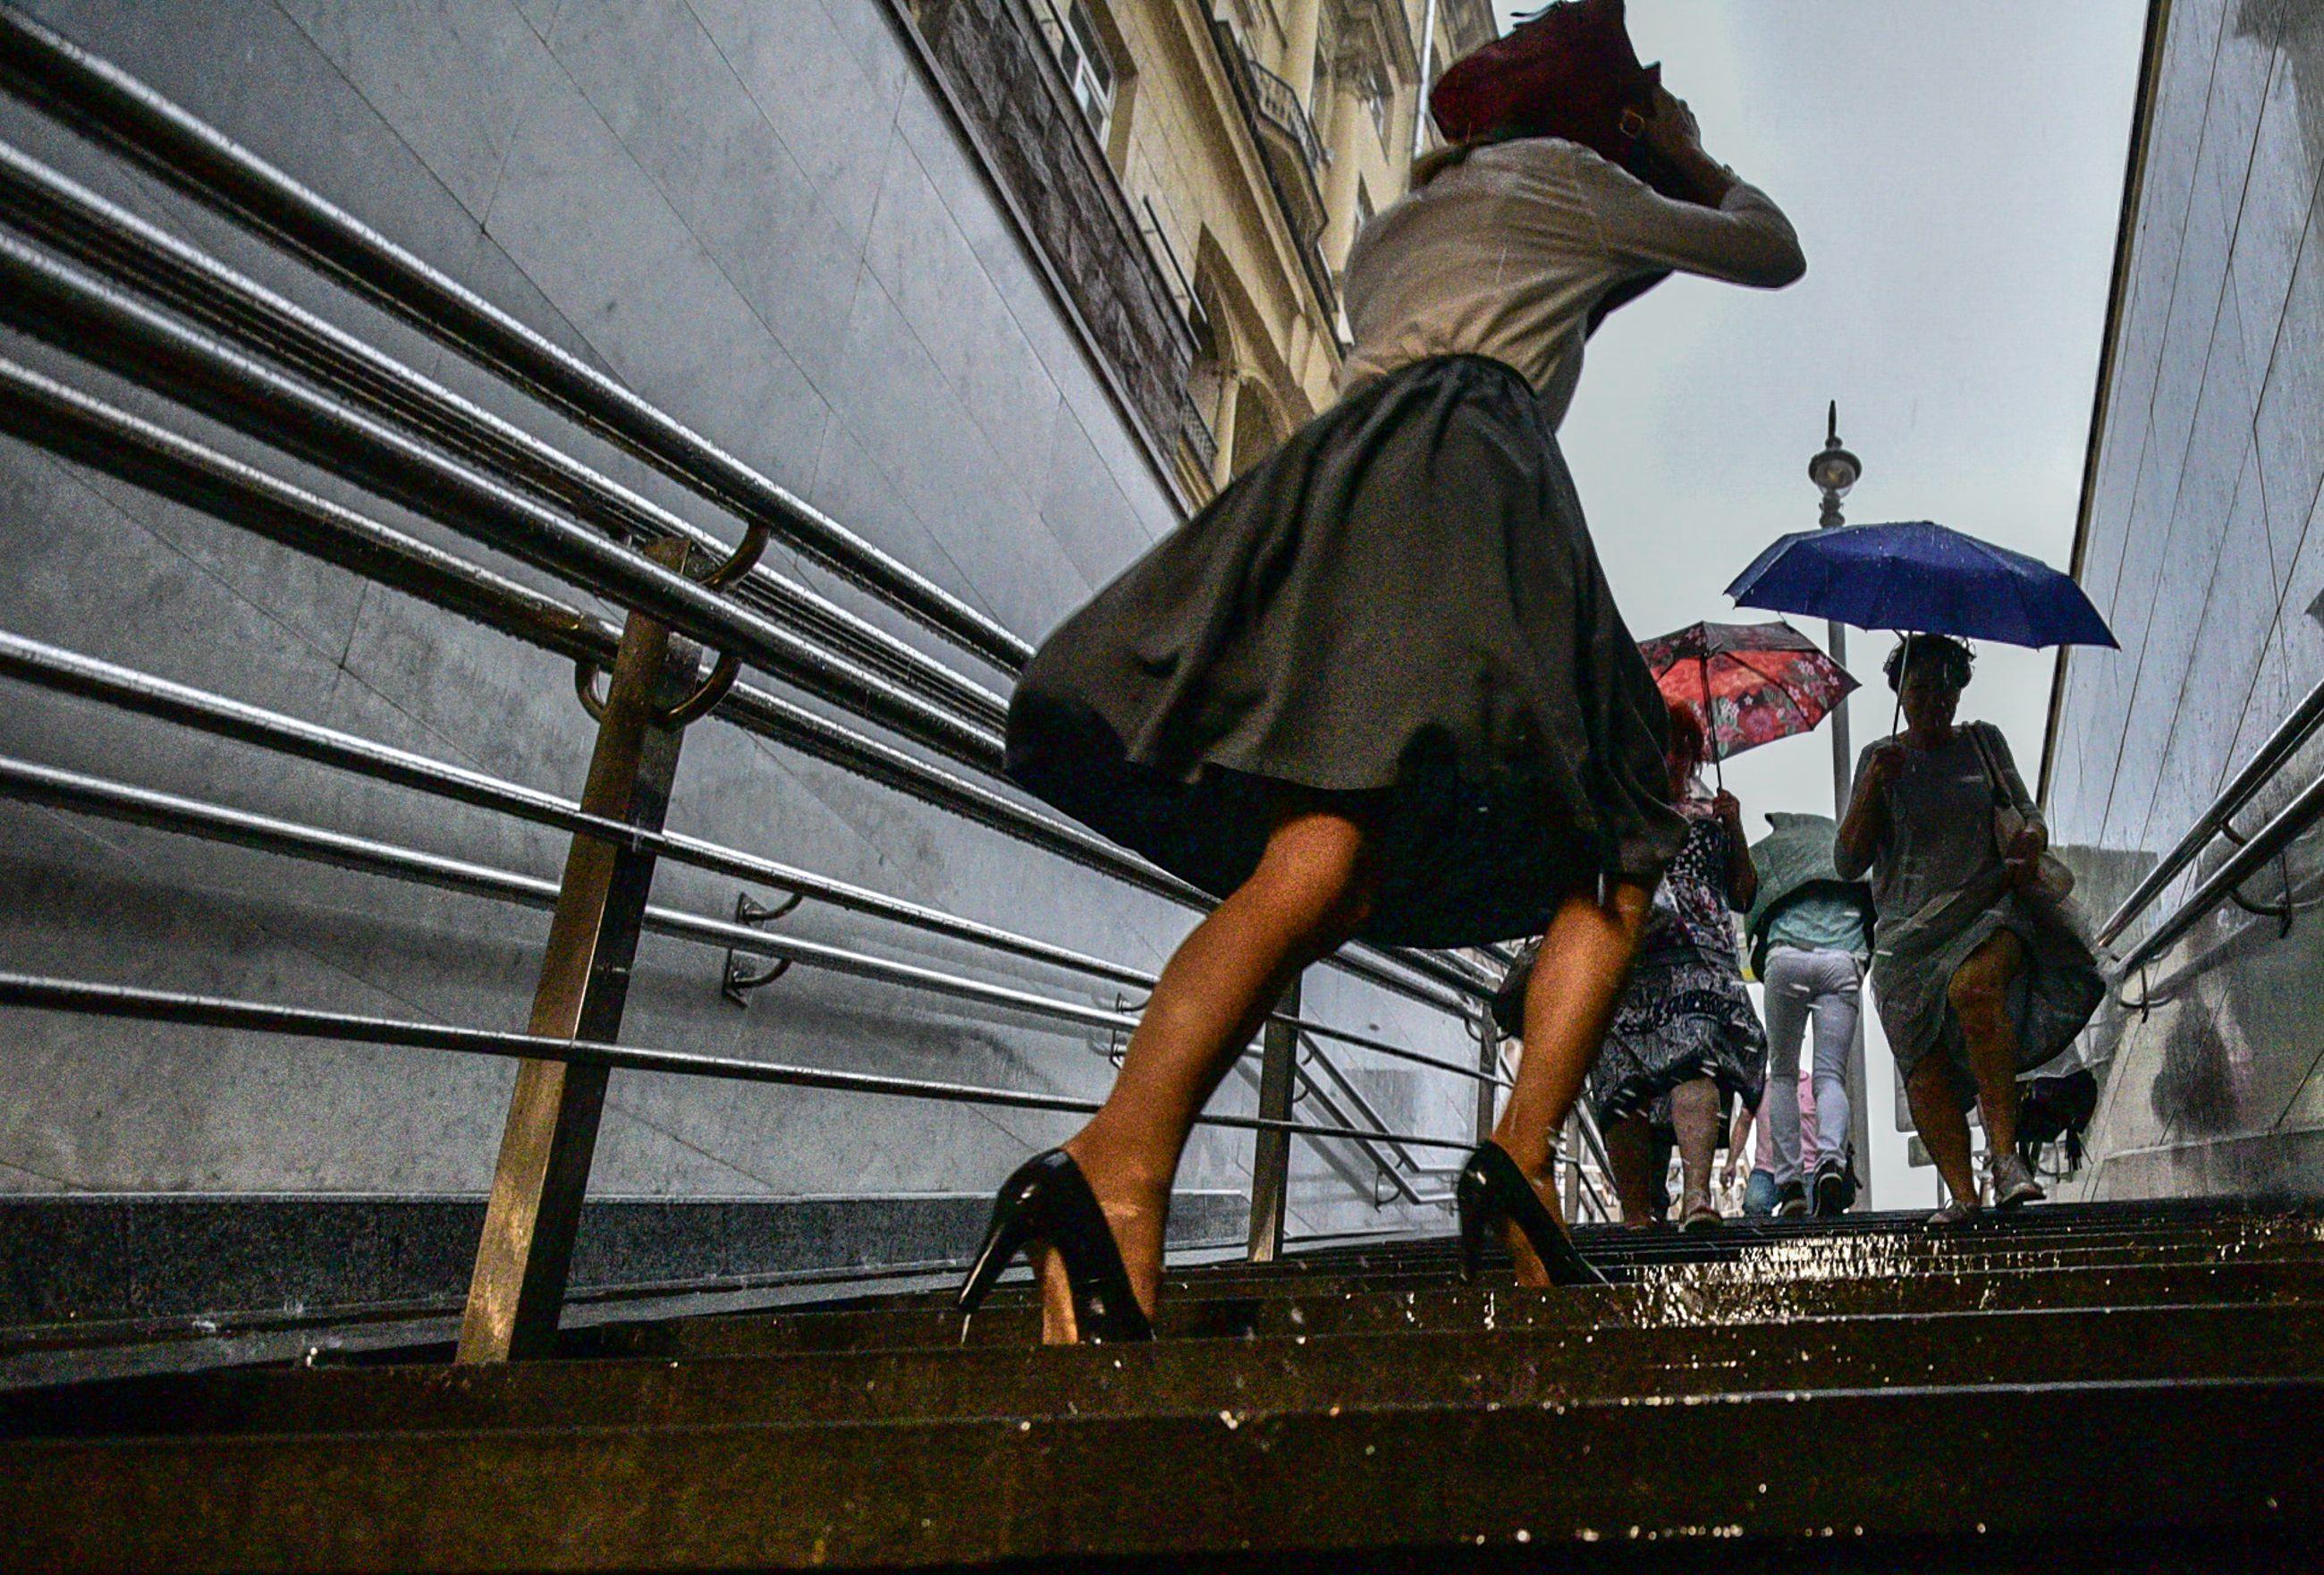 Гроза, град и шторм ждут москвичей в четверг